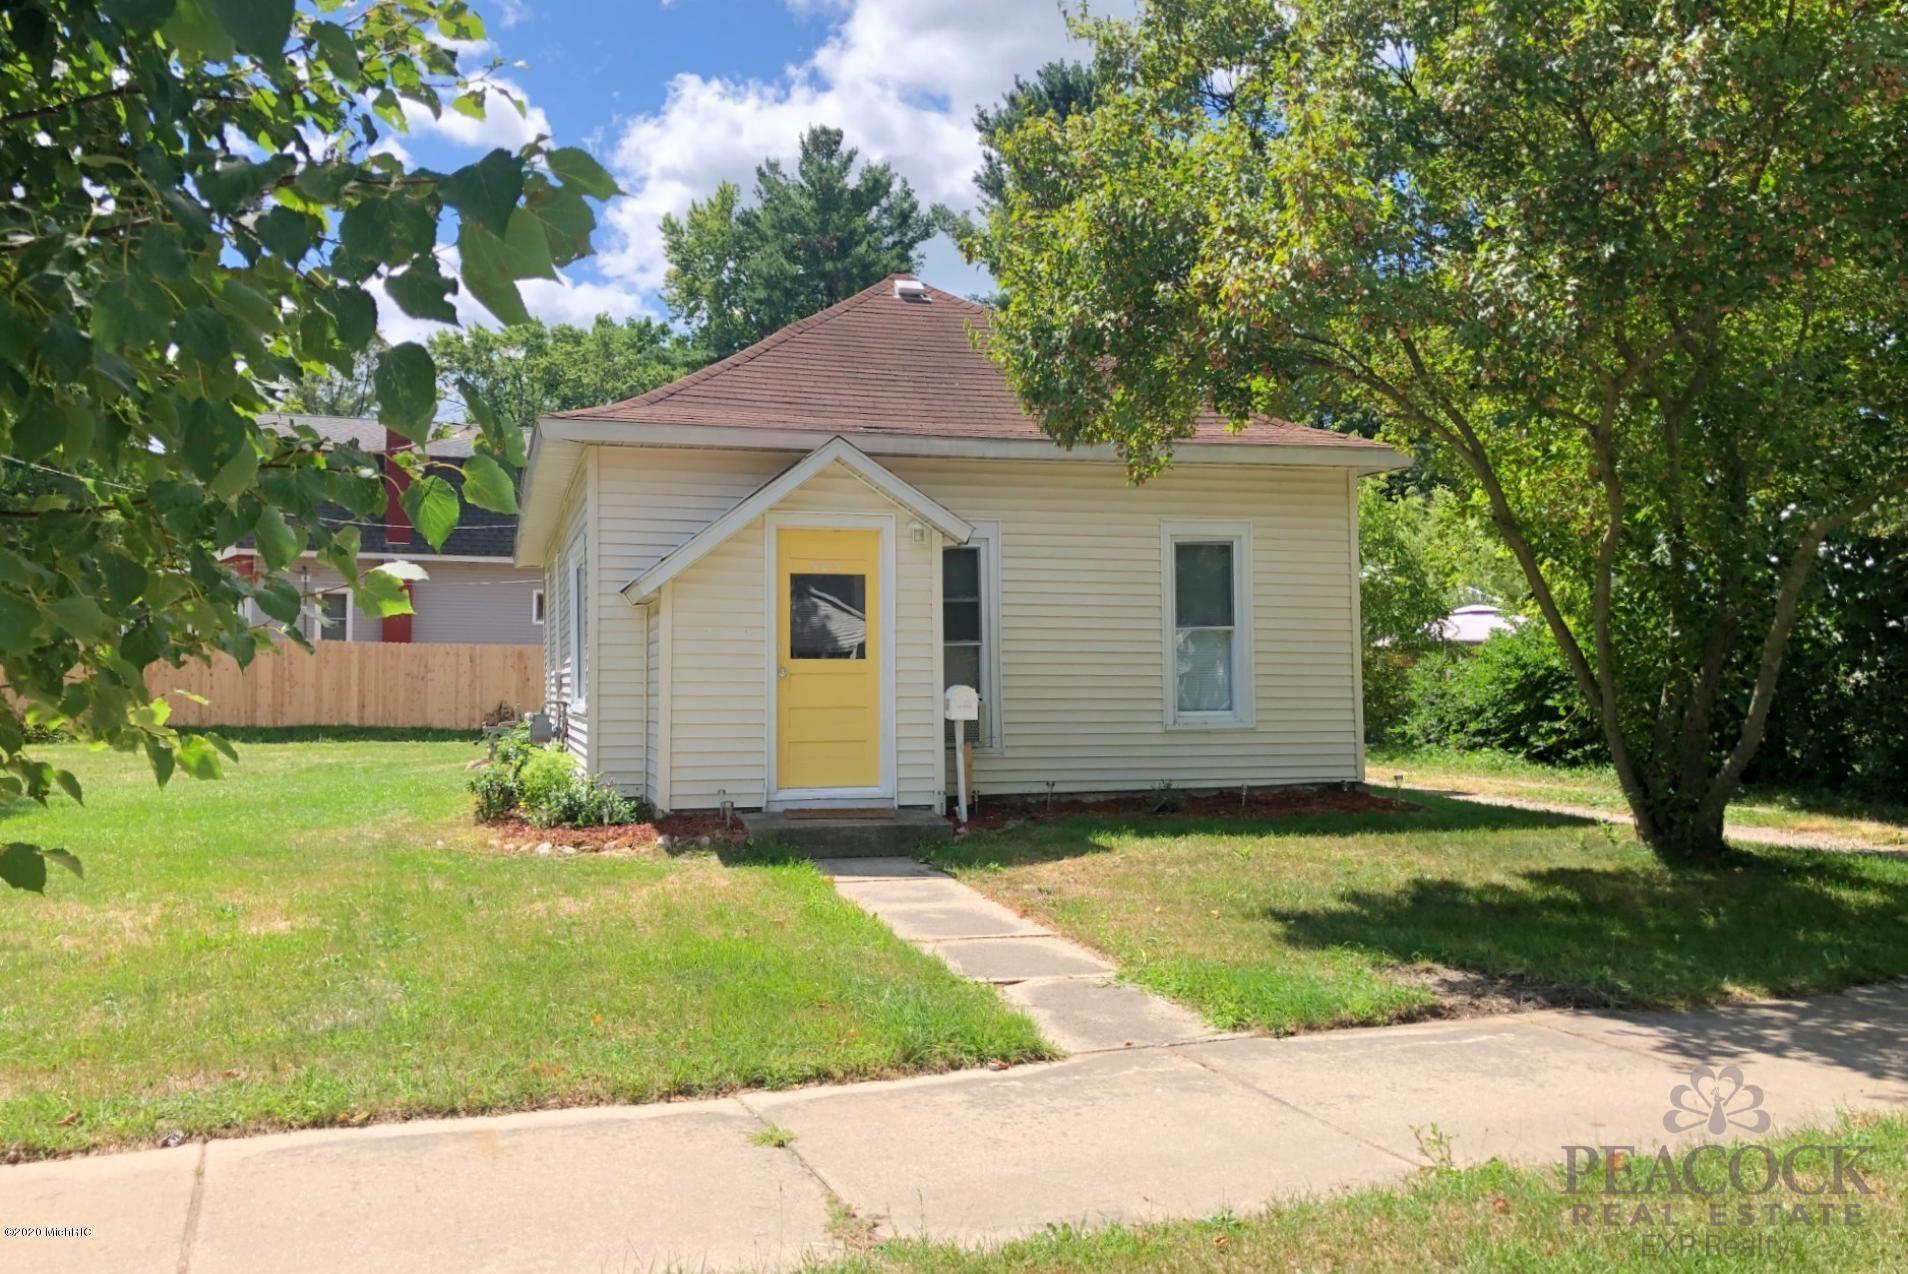 503 Rust Avenue, Big Rapids, MI 49307 - MLS#: 20033743